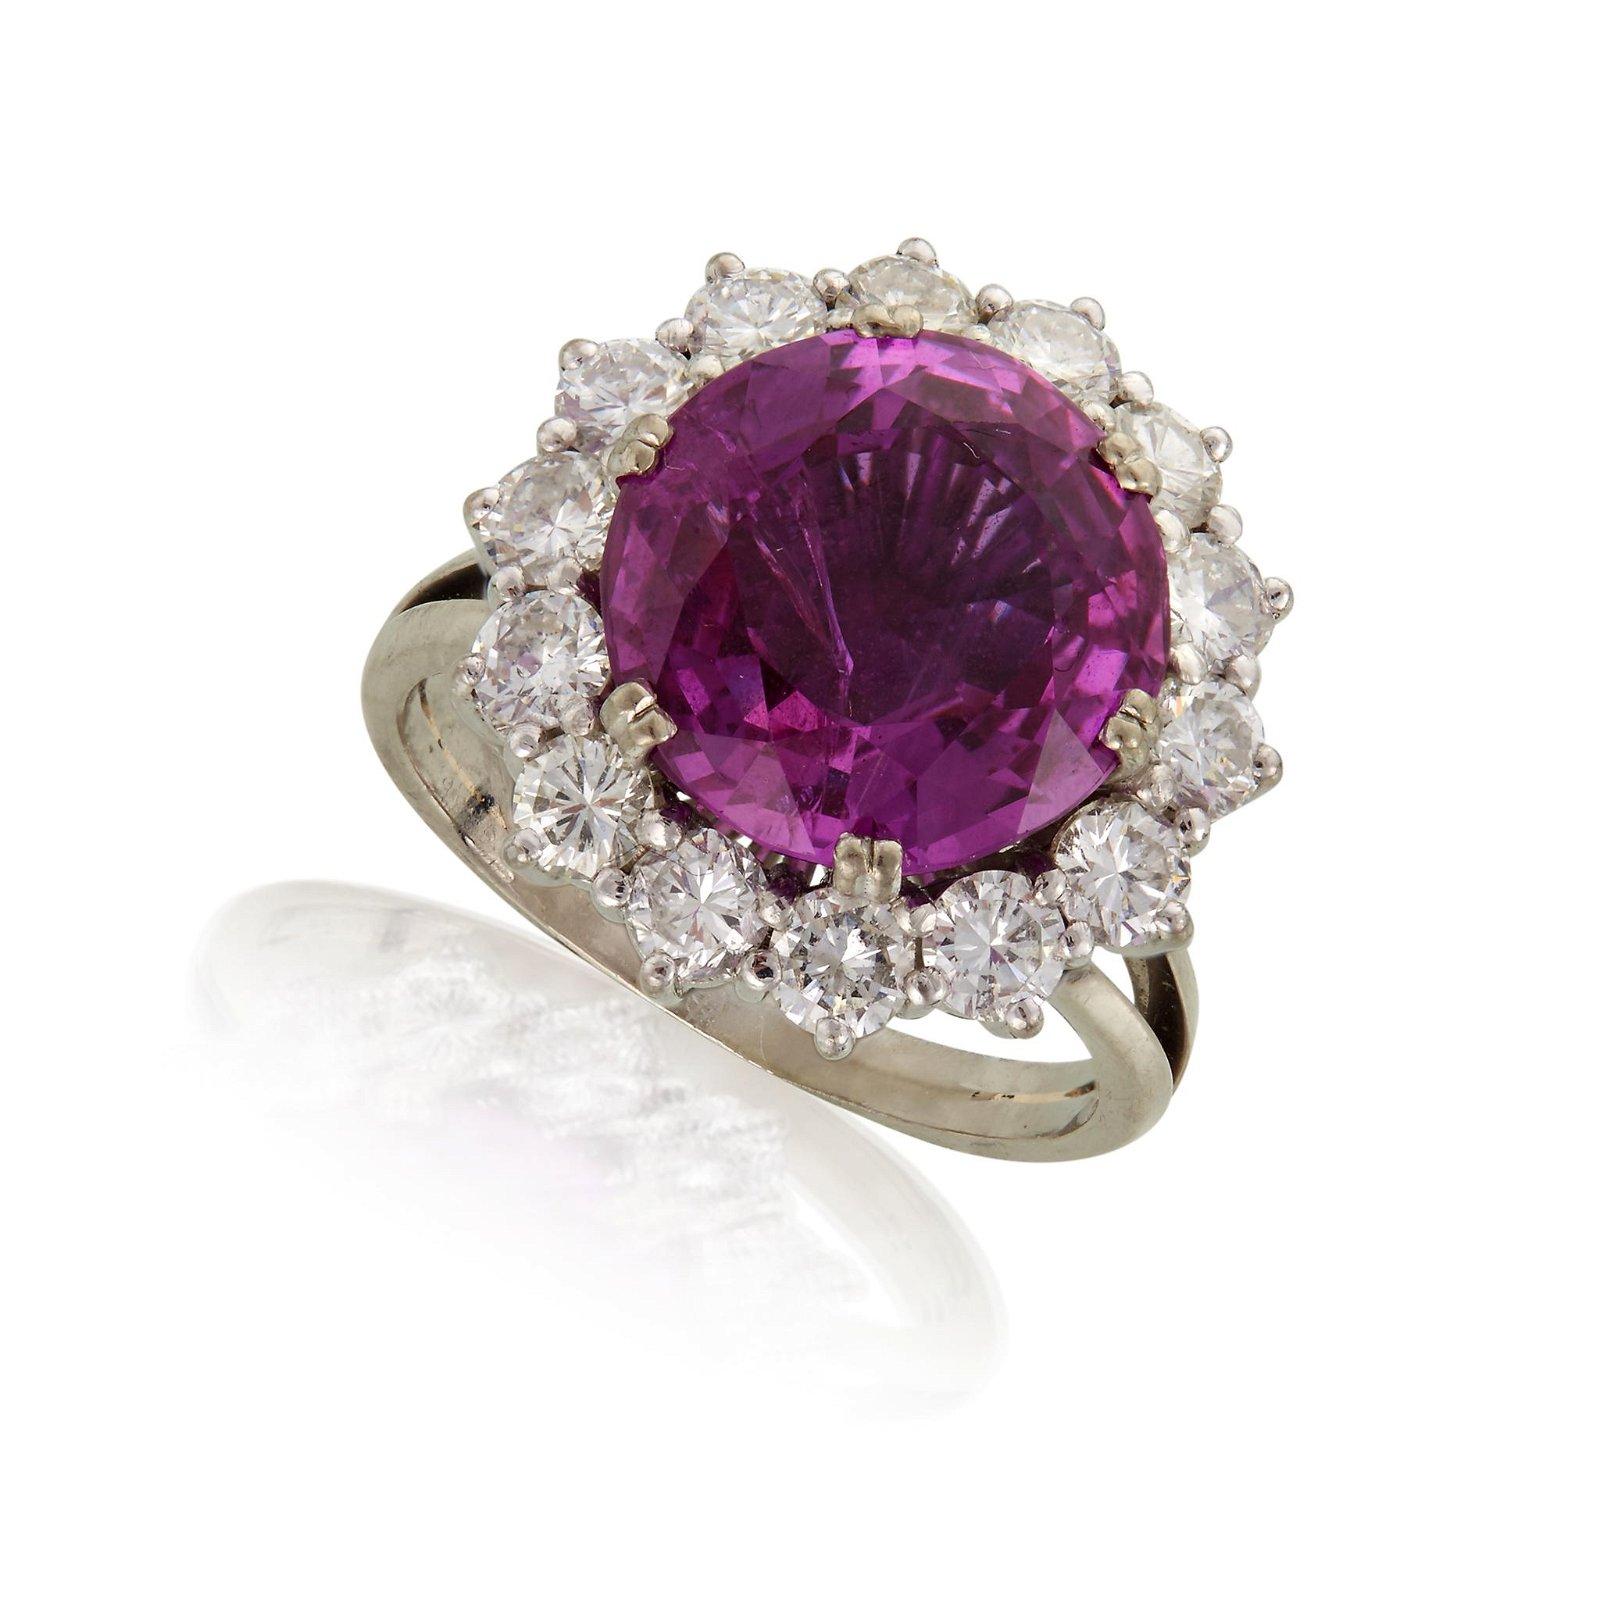 A platinum, pink sapphire, and diamond ring,